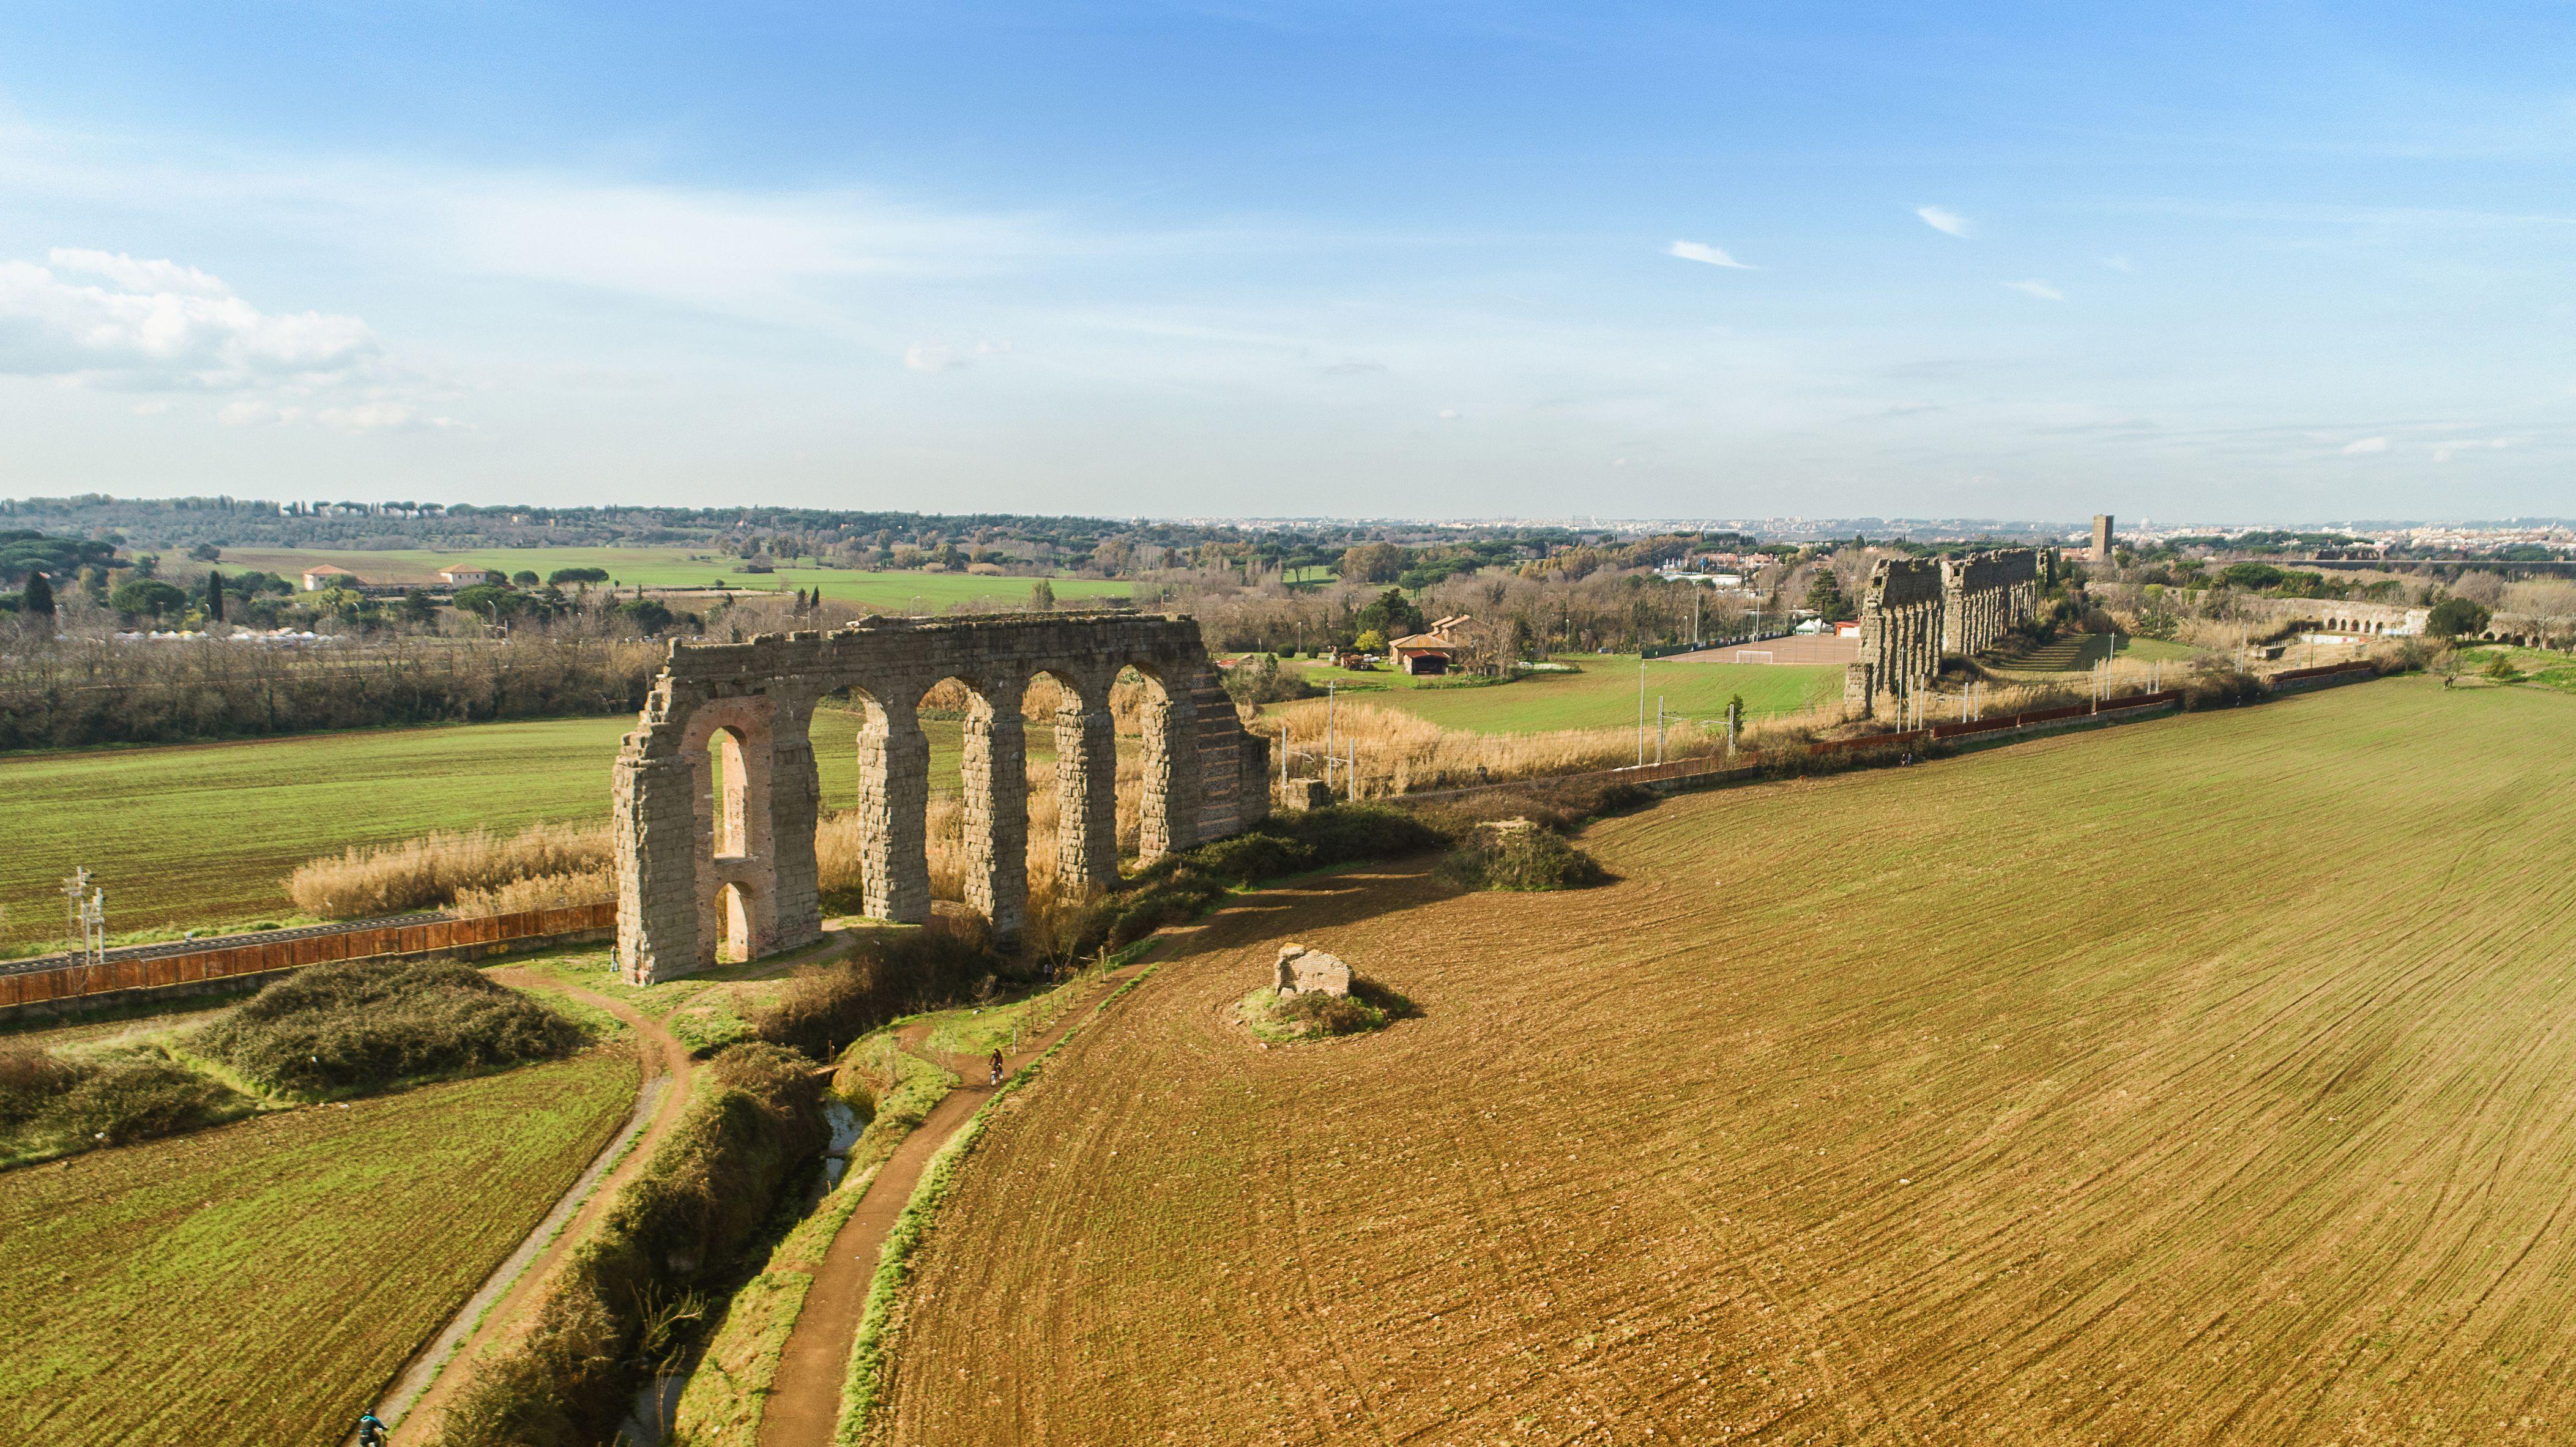 Aerial view of the Aqueduct Park